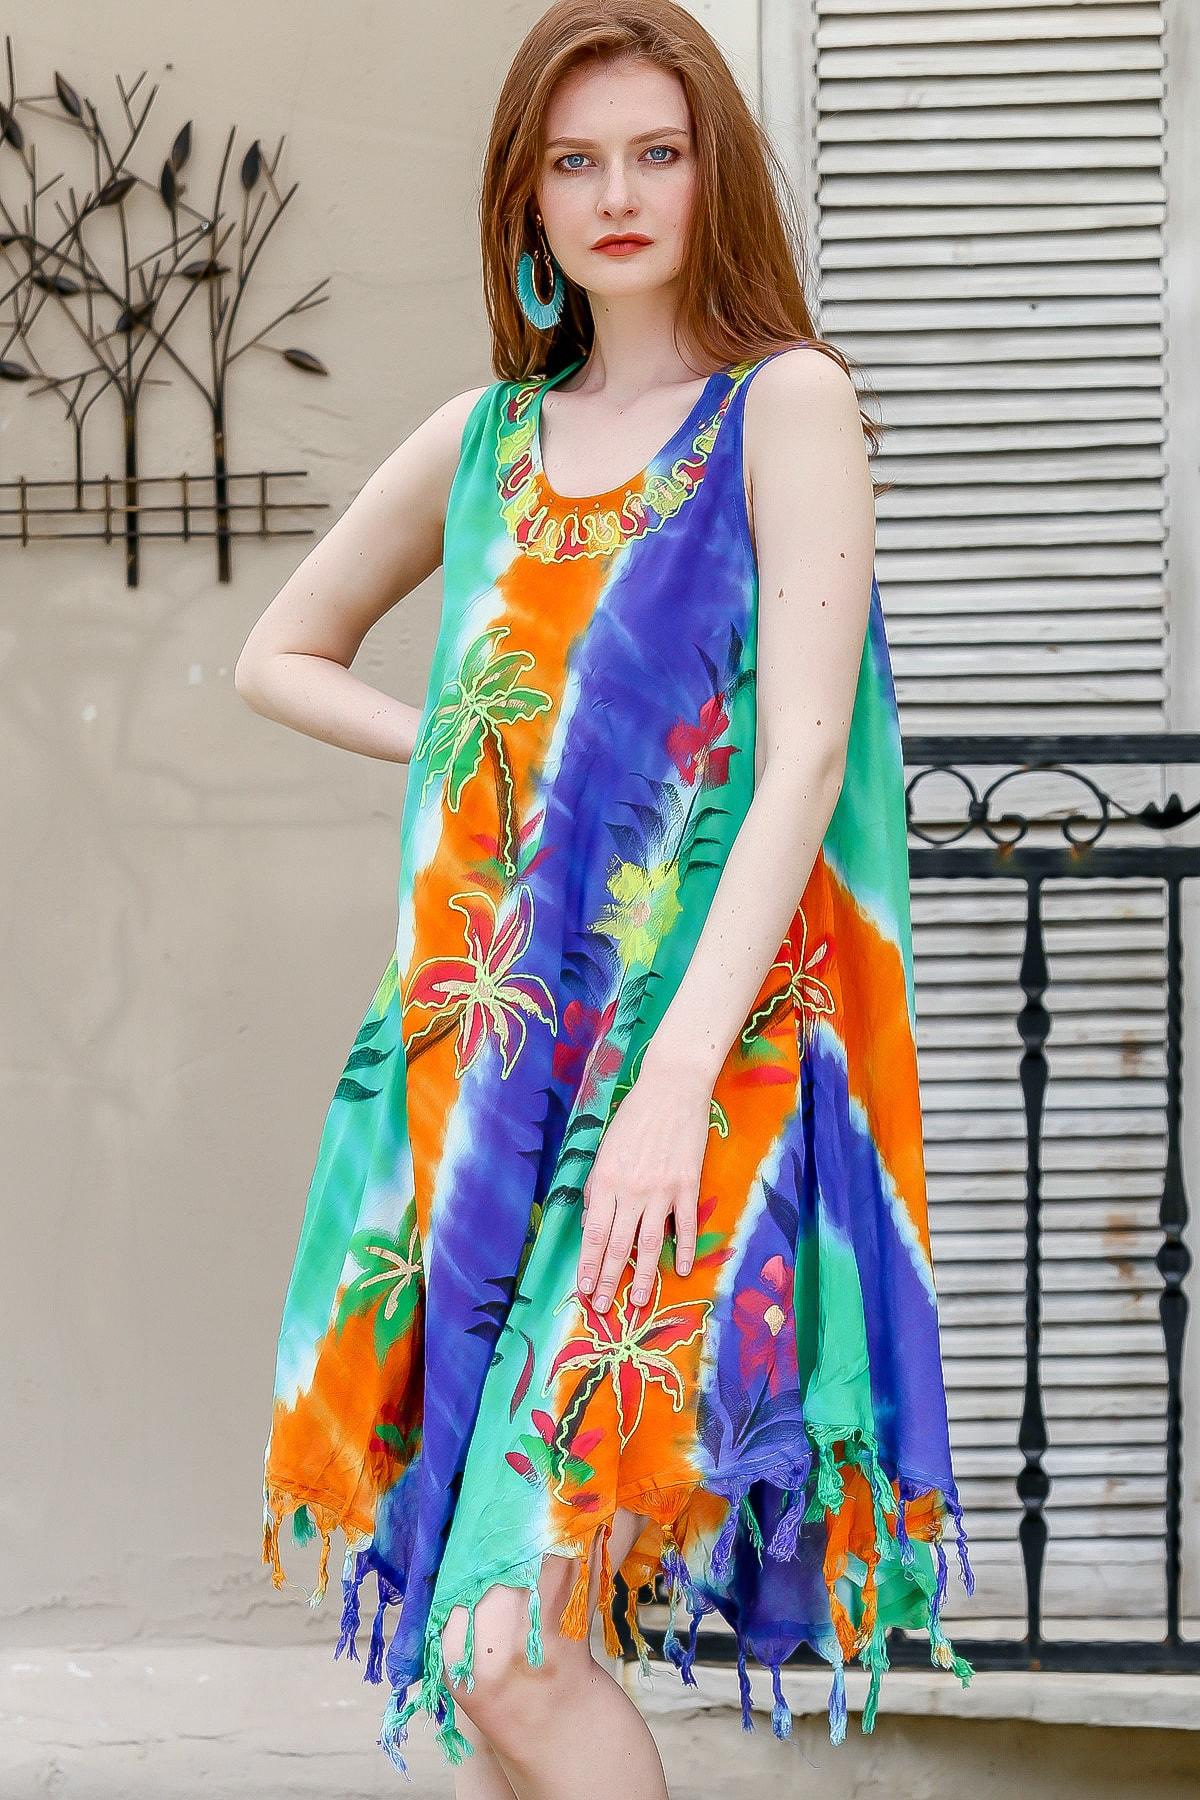 Chiccy Kadın Turuncu-Mavi Dikine Renk Bloklu Batik Elbise M10160000EL94859